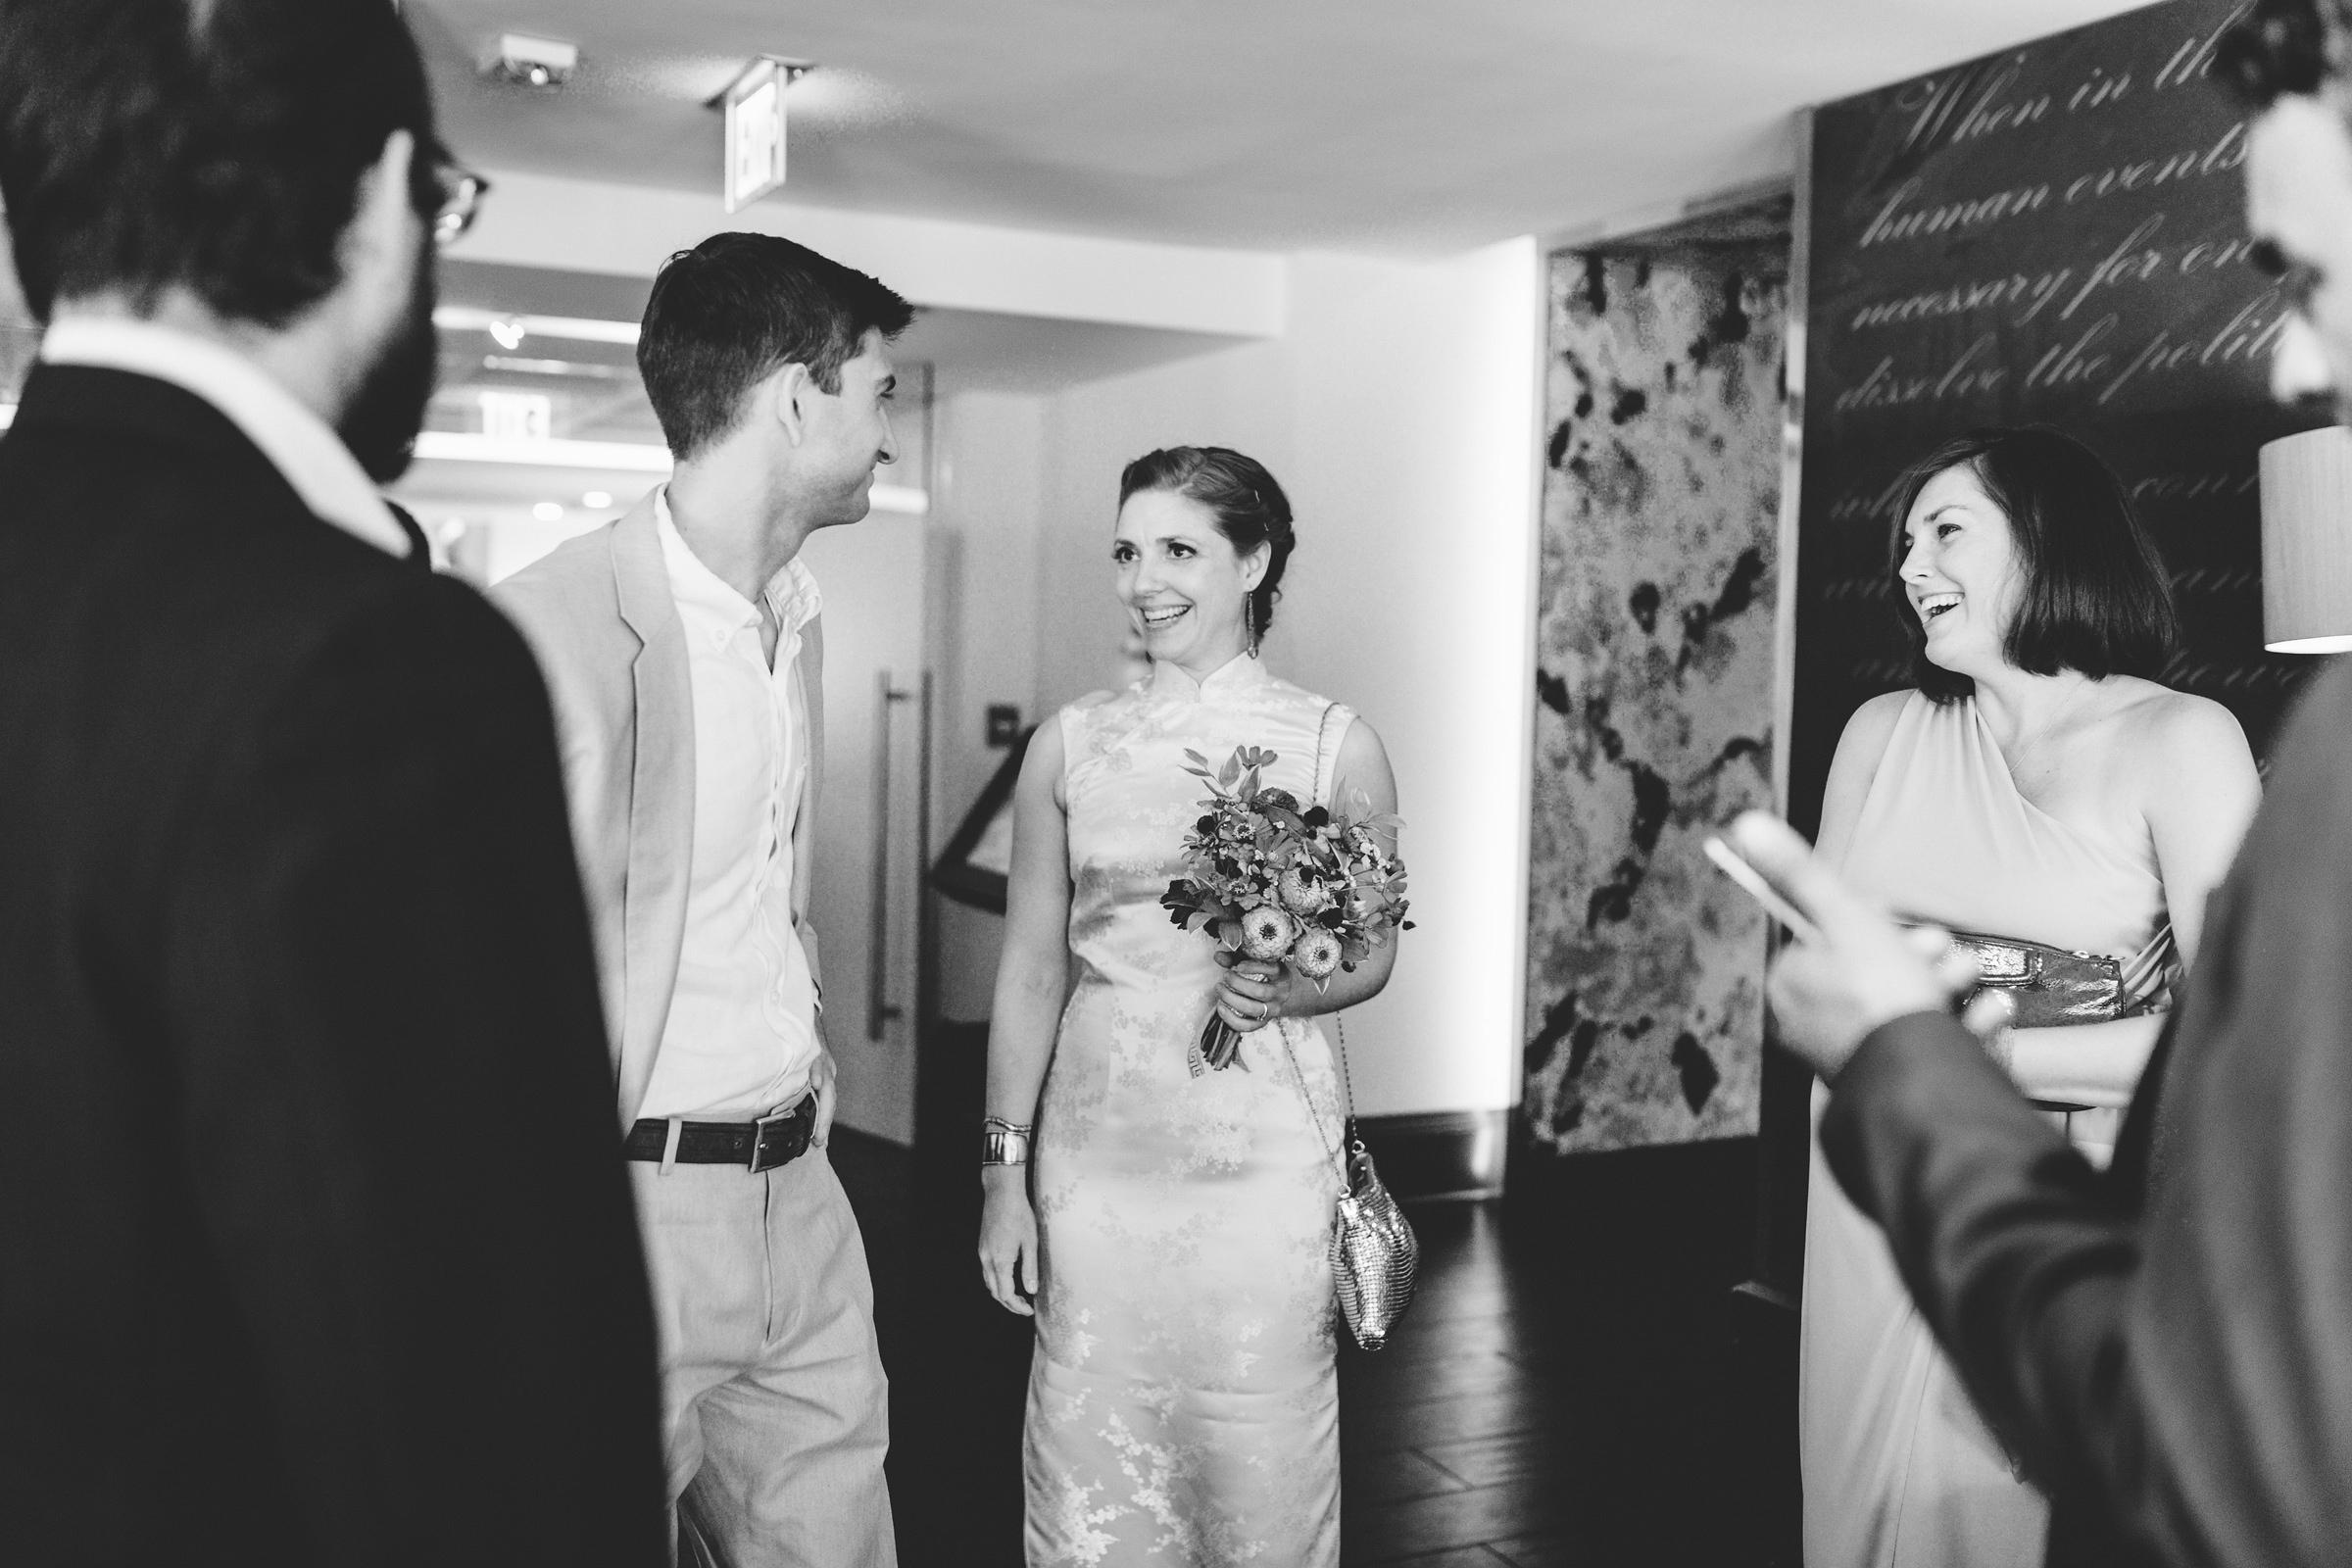 Kentucky_Candid_Wedding_Photographer_51.jpg